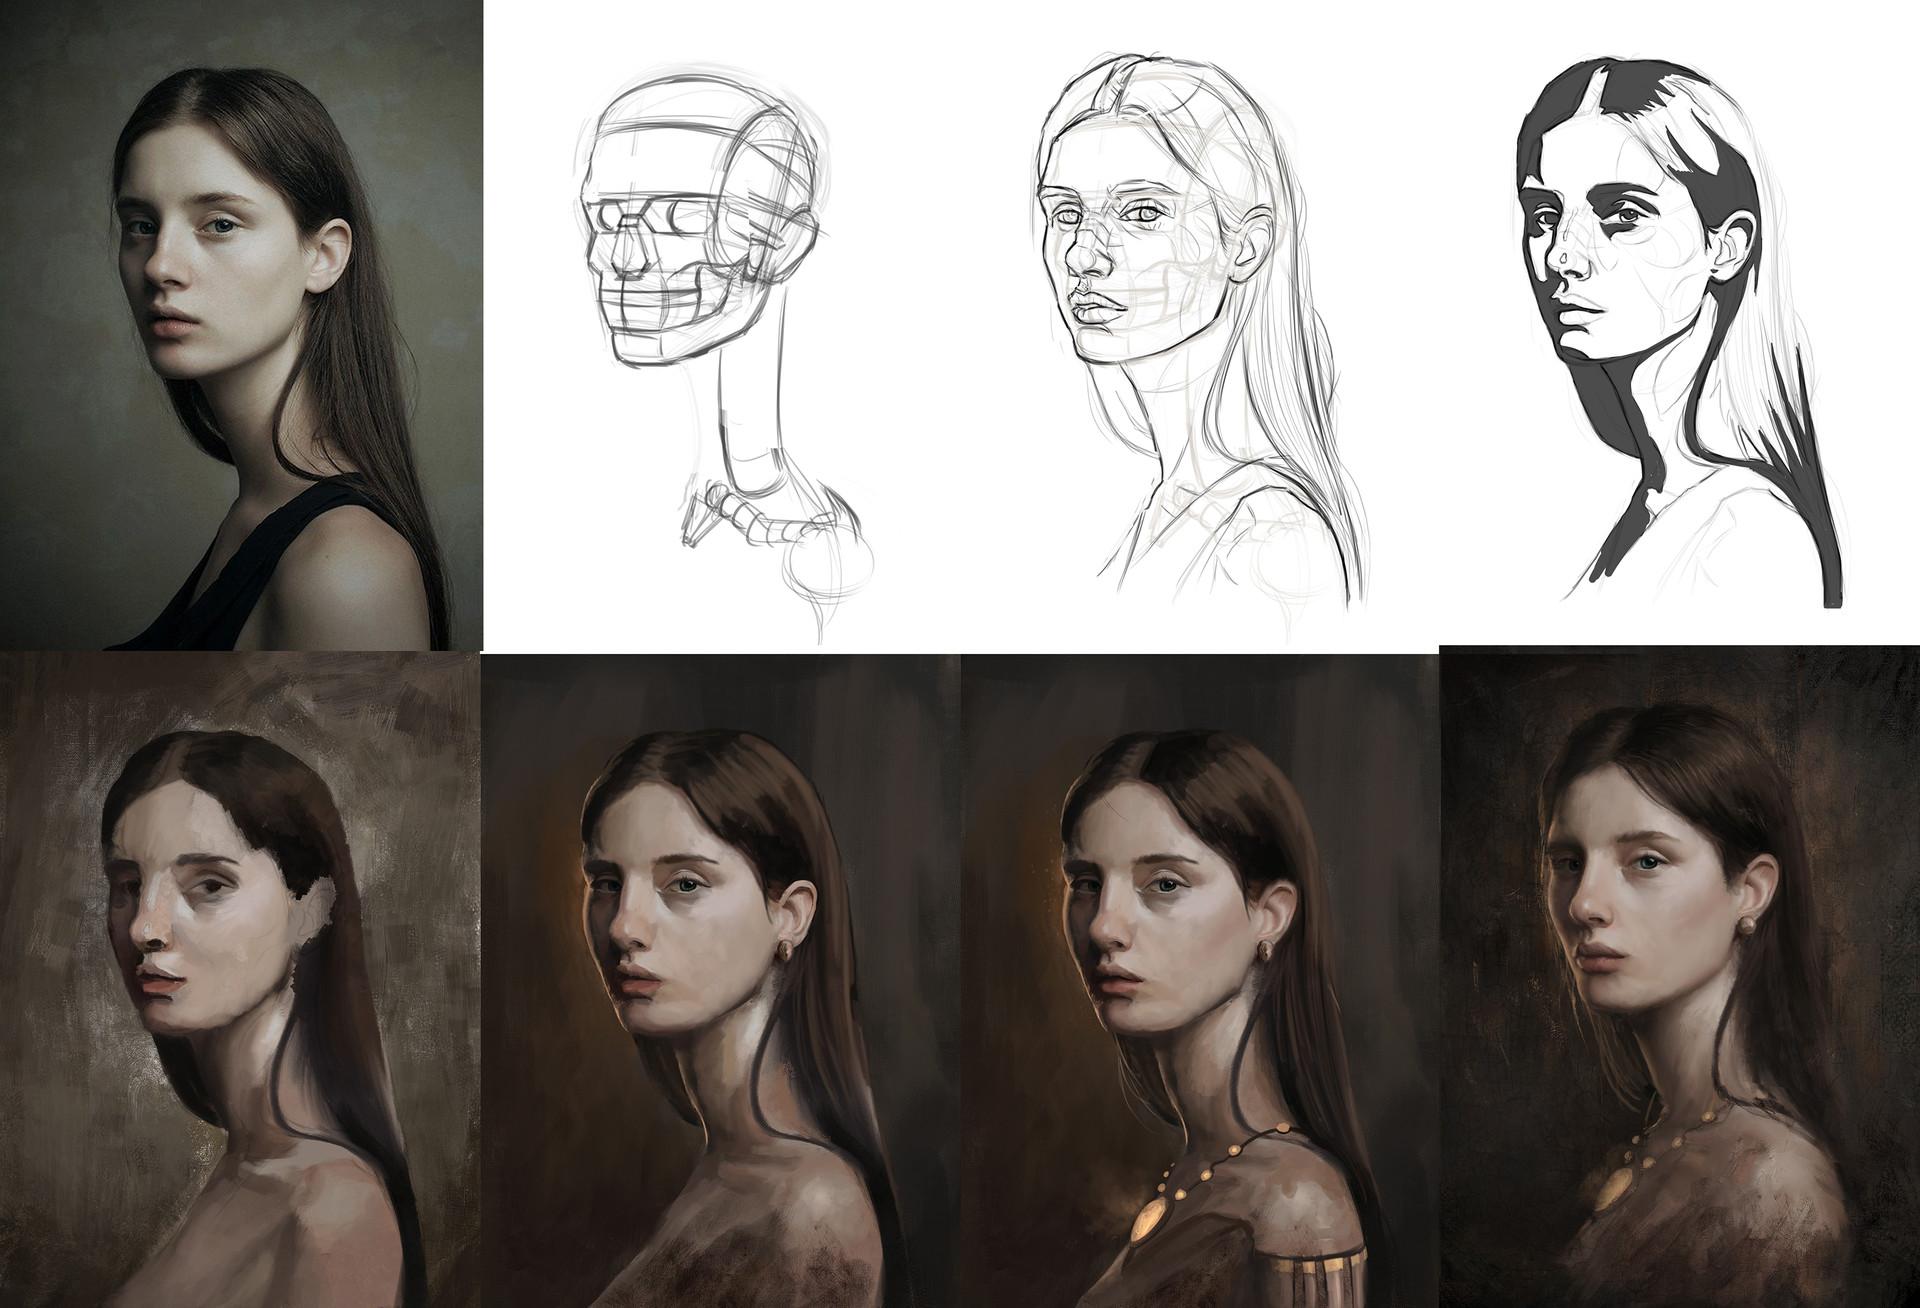 Dennis van kessel portrait study wips